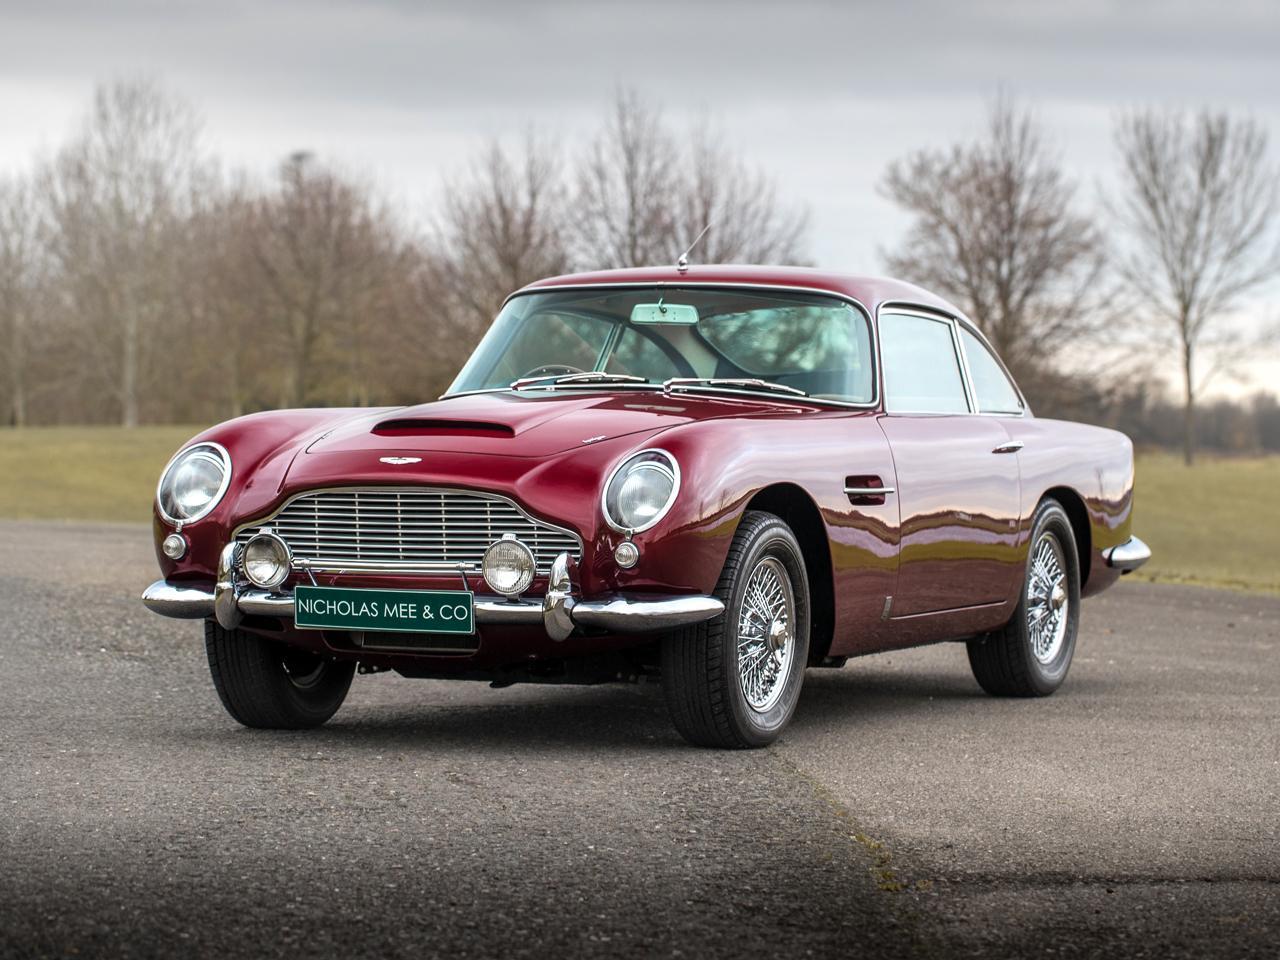 Ex-Robert Plant Aston Martin DB5 for sale